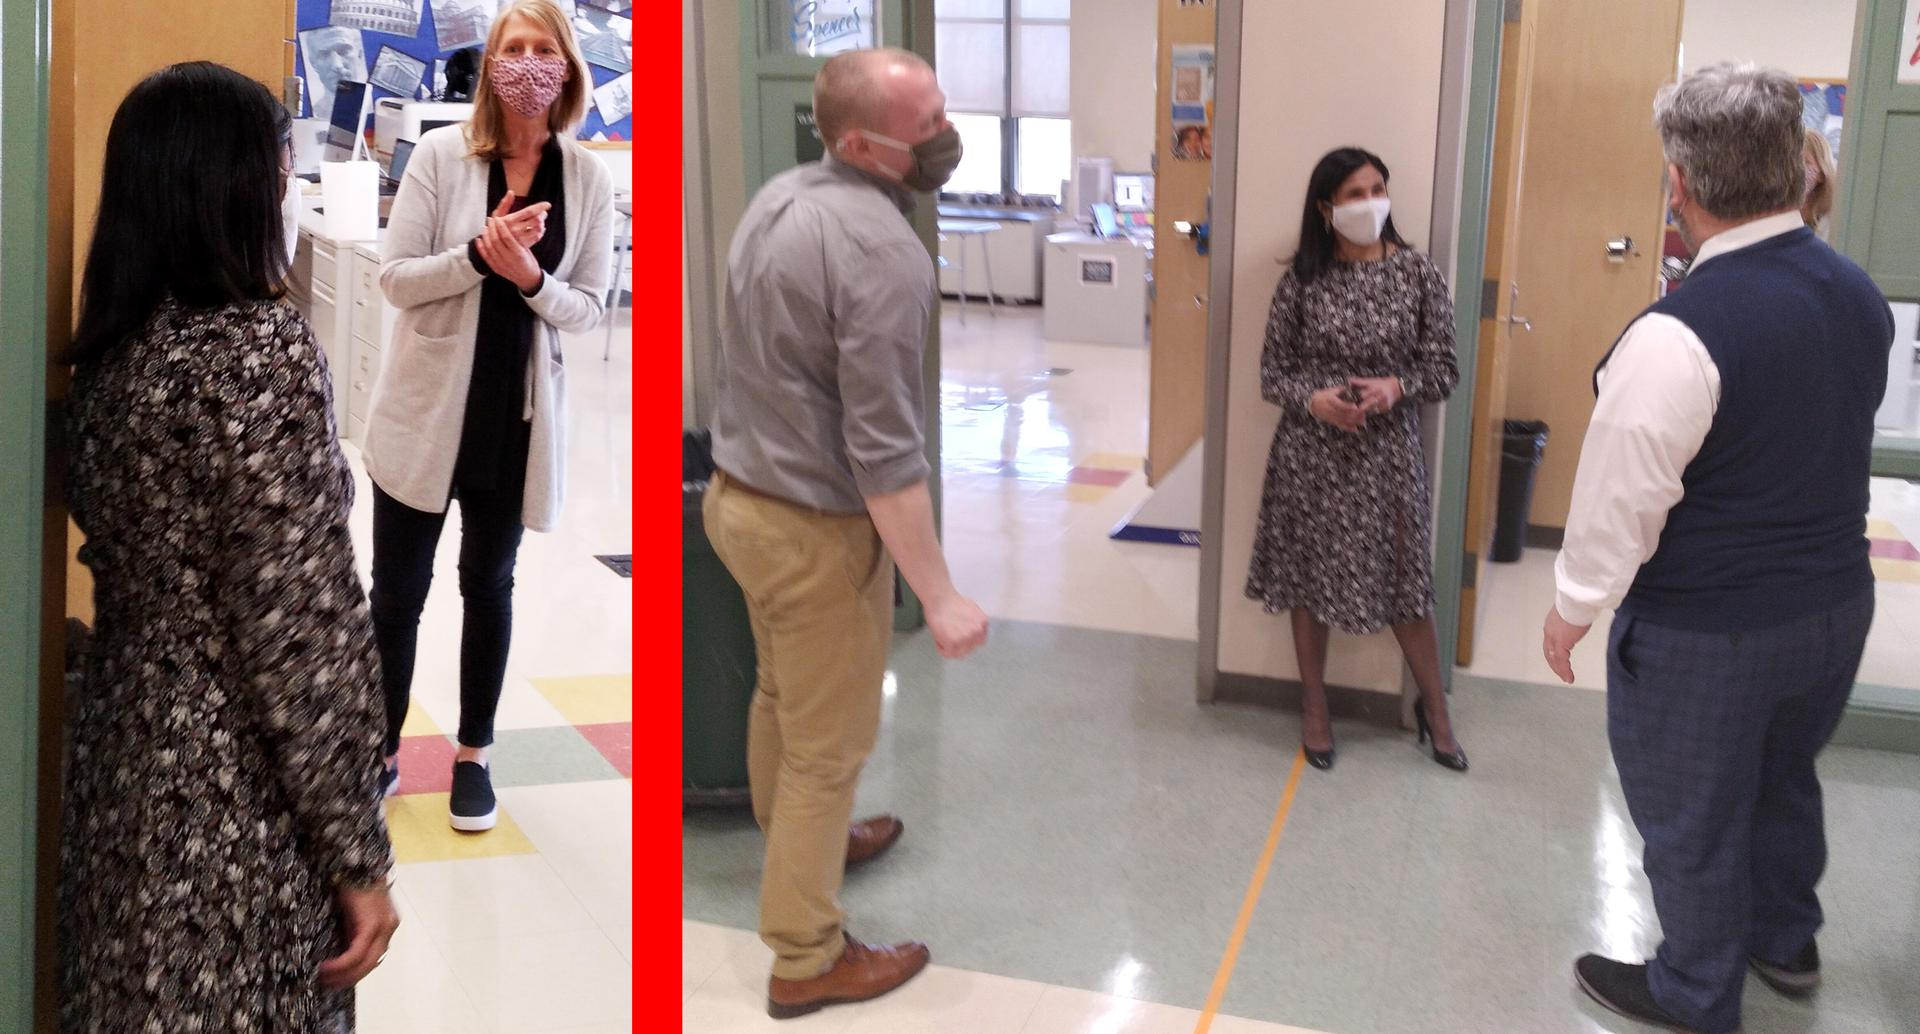 Two-tile photo, superintendent talking to educators